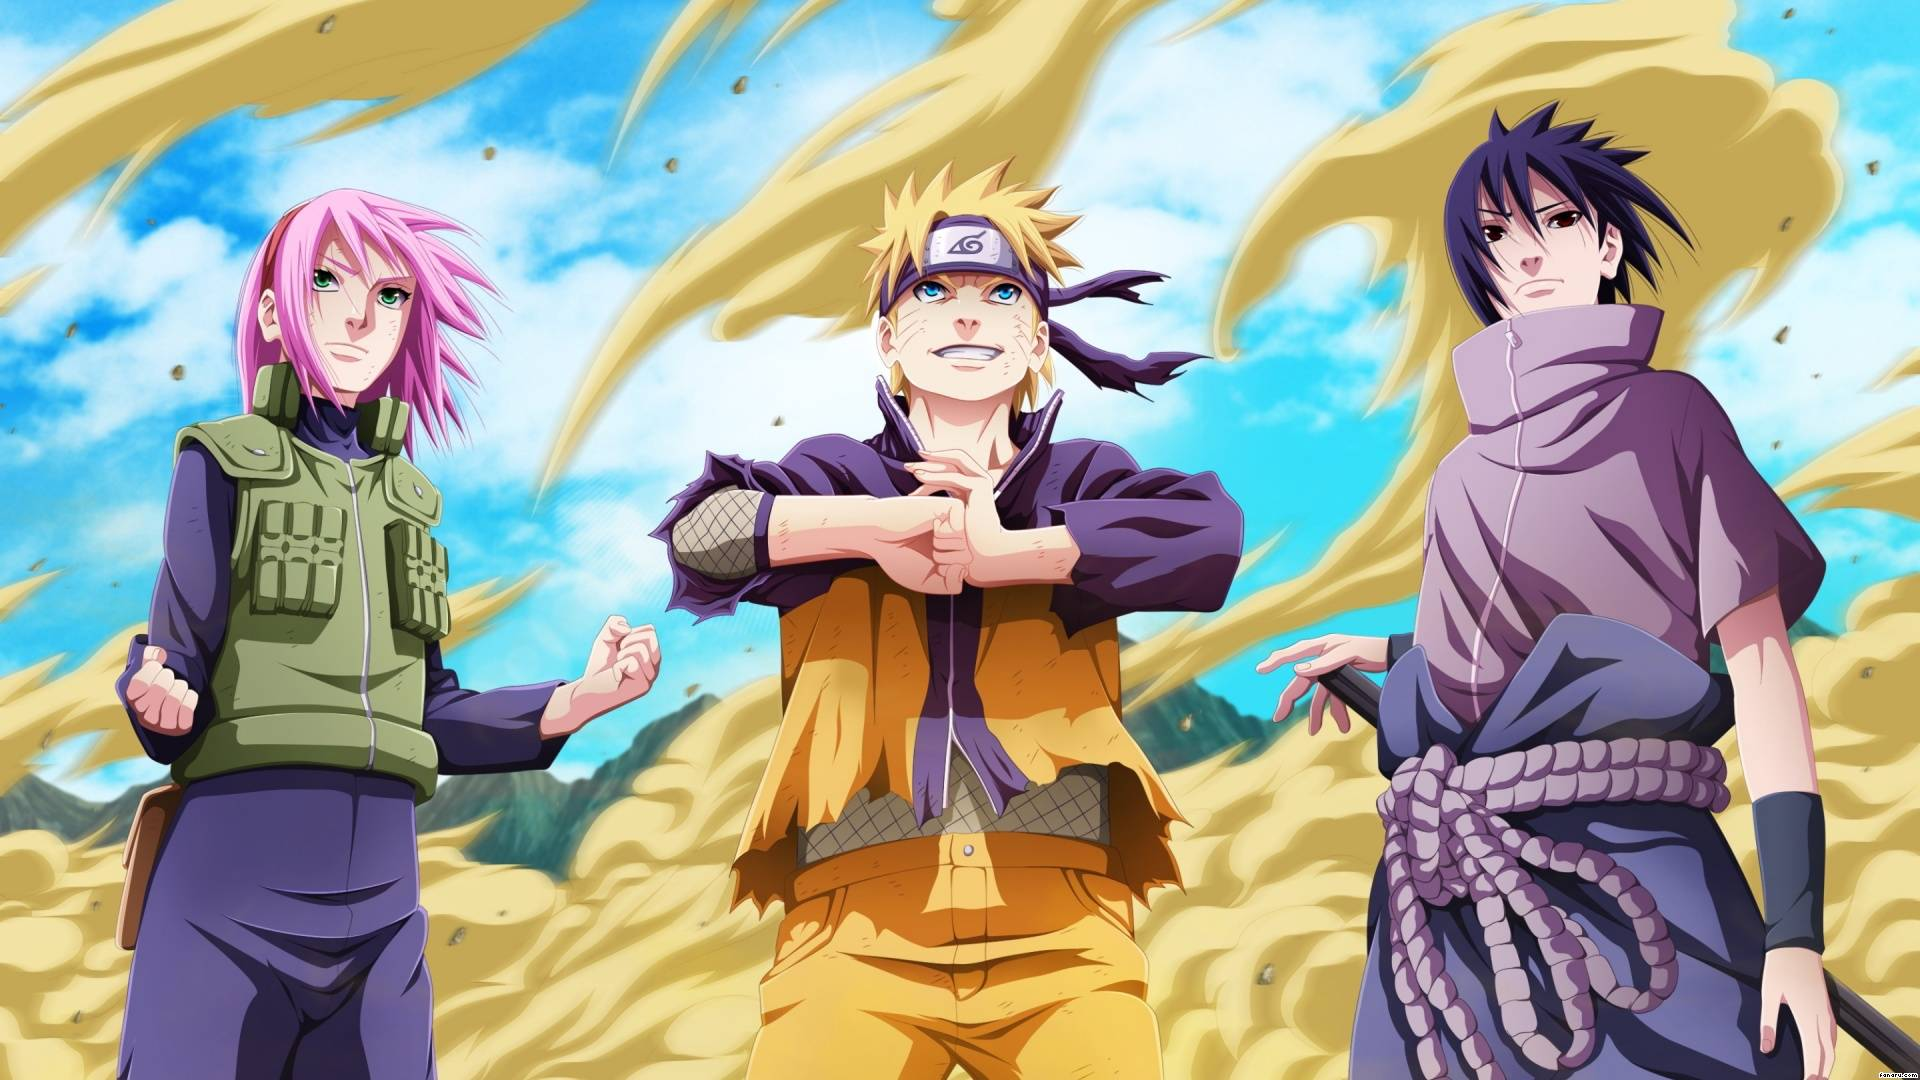 best-anime-naruto-sasuke-sakura-wallpaper-hd-6